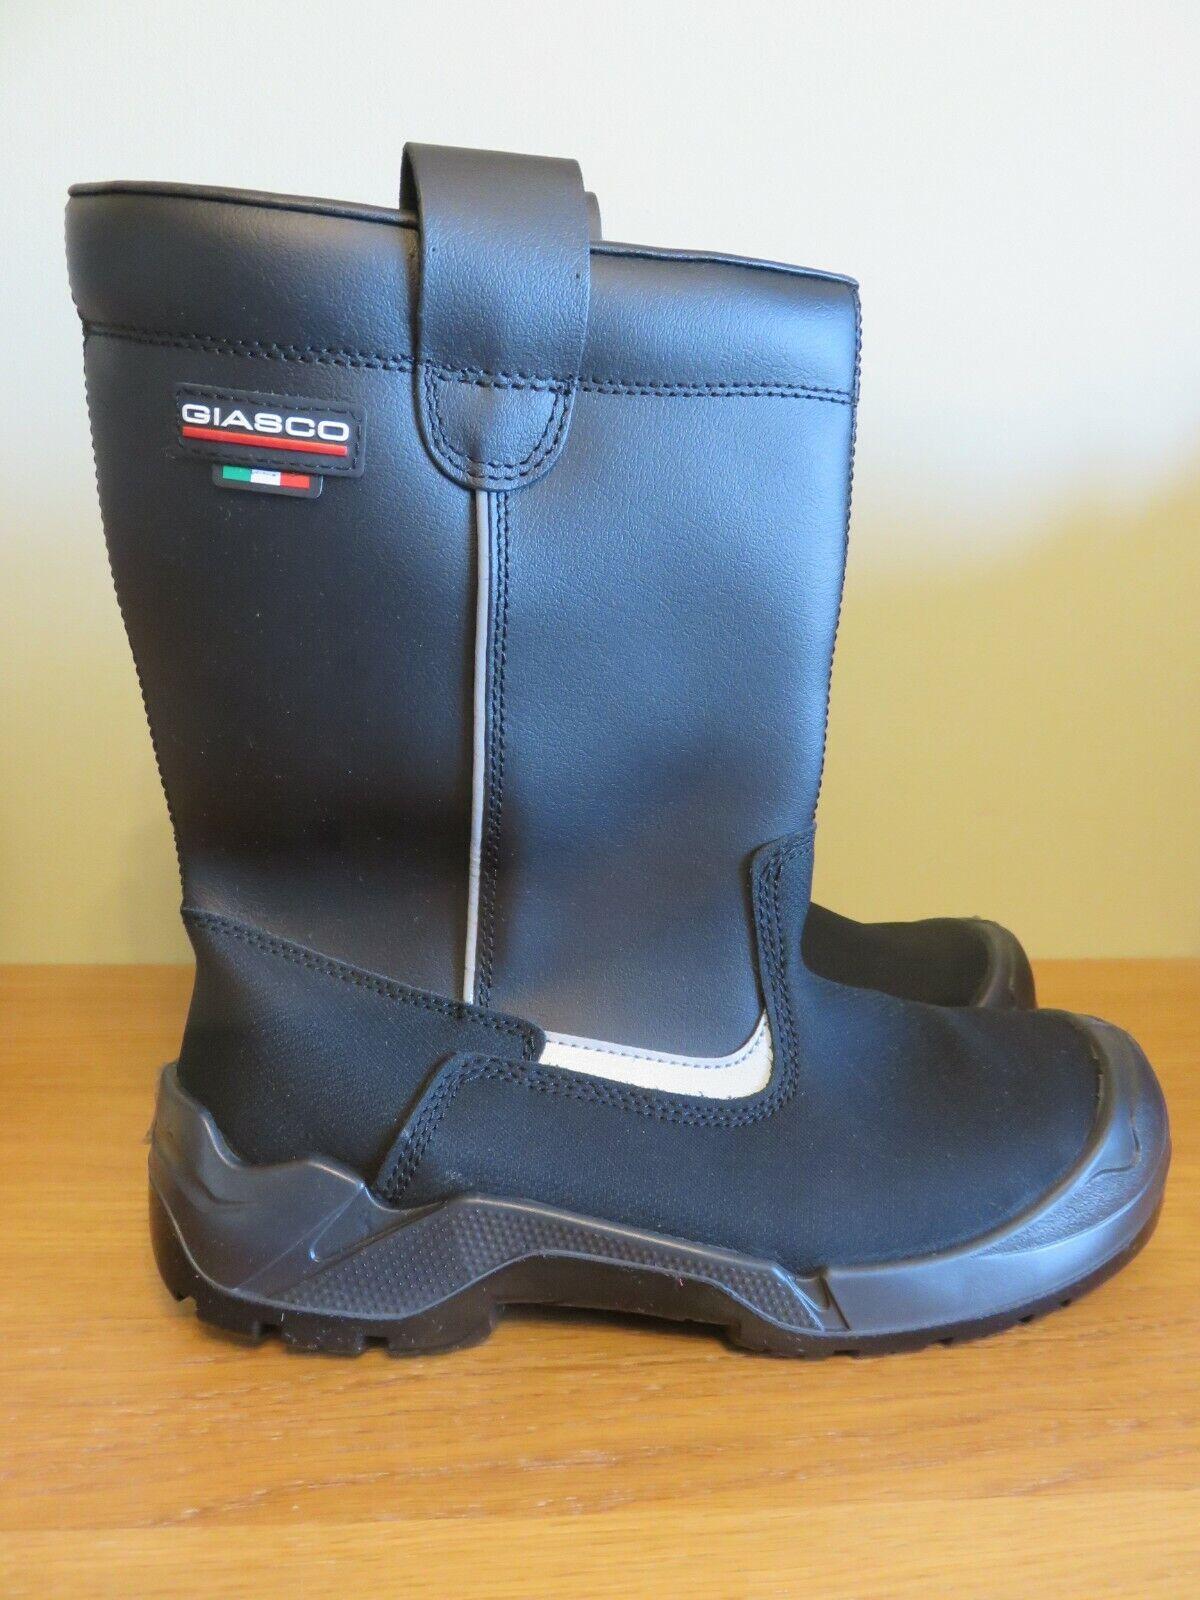 Giasco Dakota S3 CL Safety Boot - Size 43 (UK 9) - Black - NEW - Bargain Price